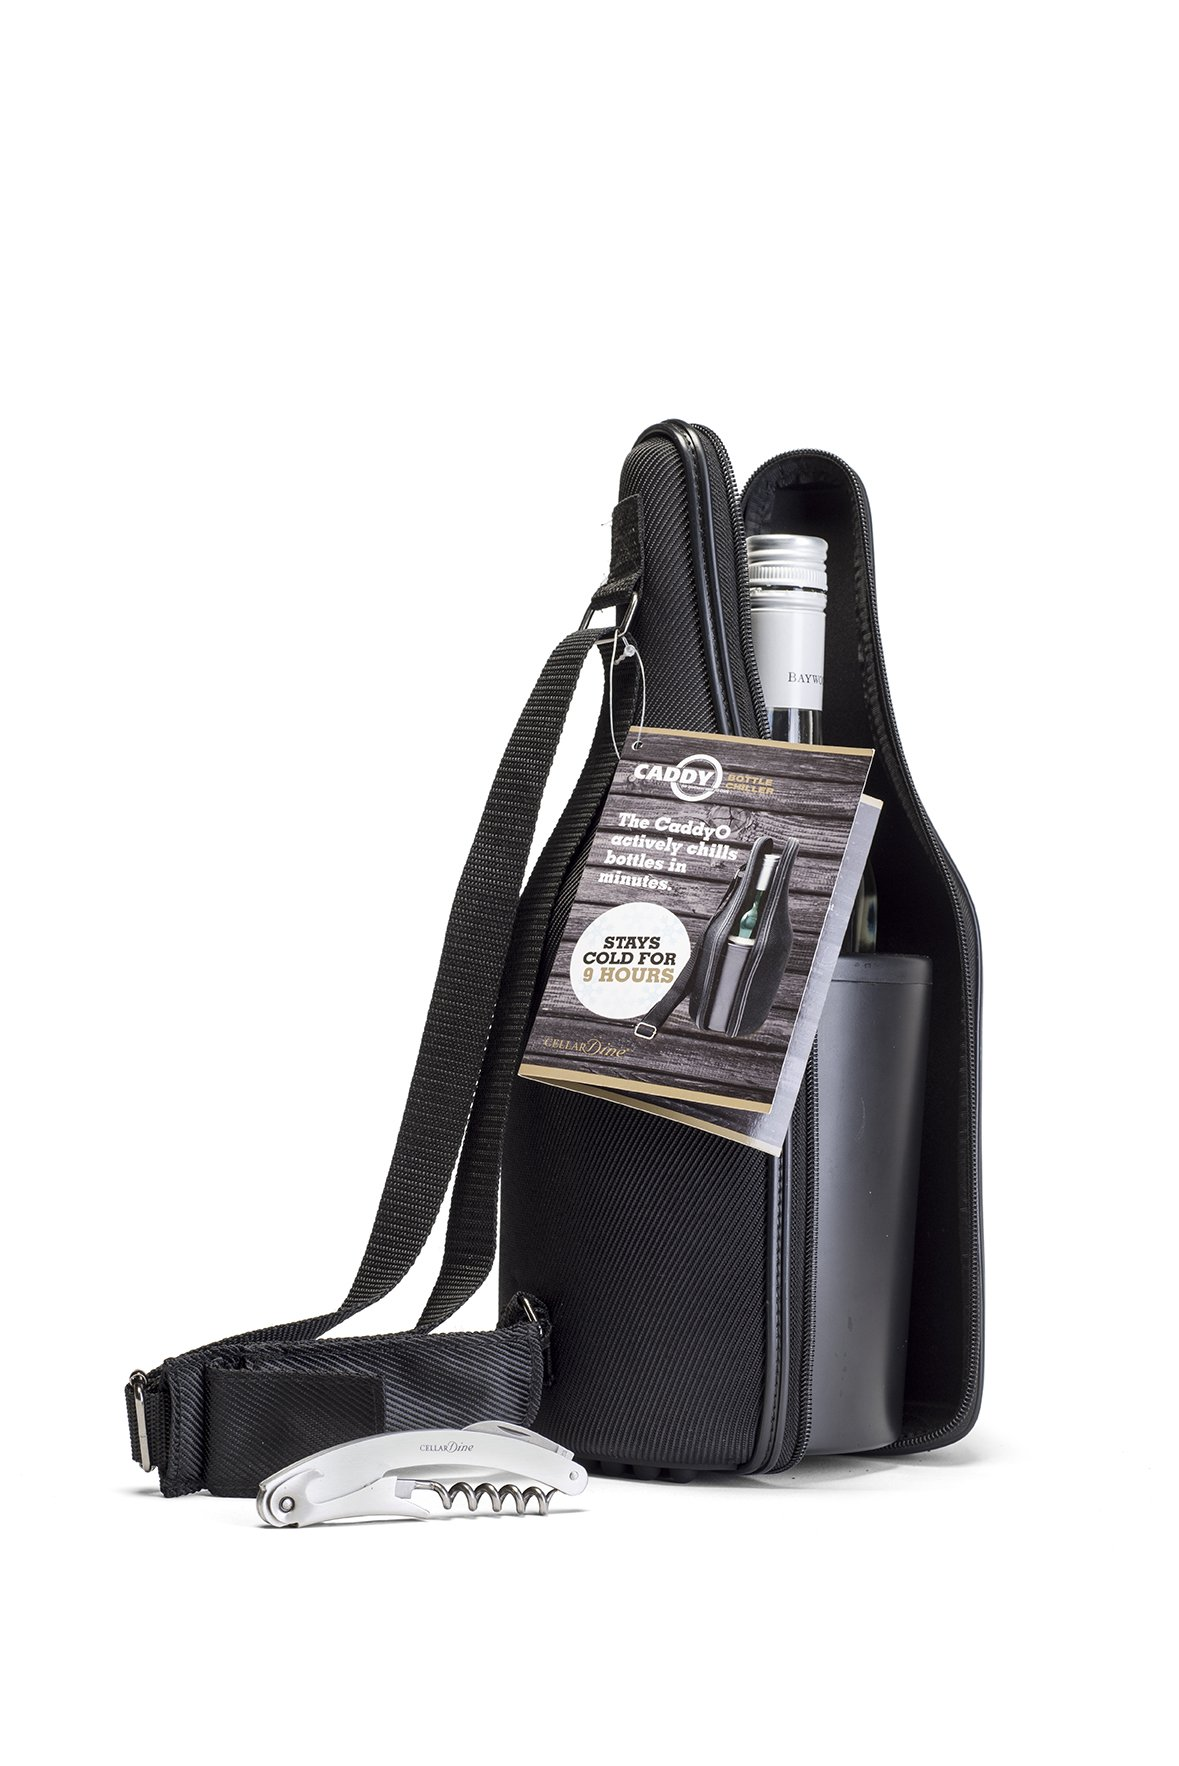 CaddyO WT-04 Black Wine Tote